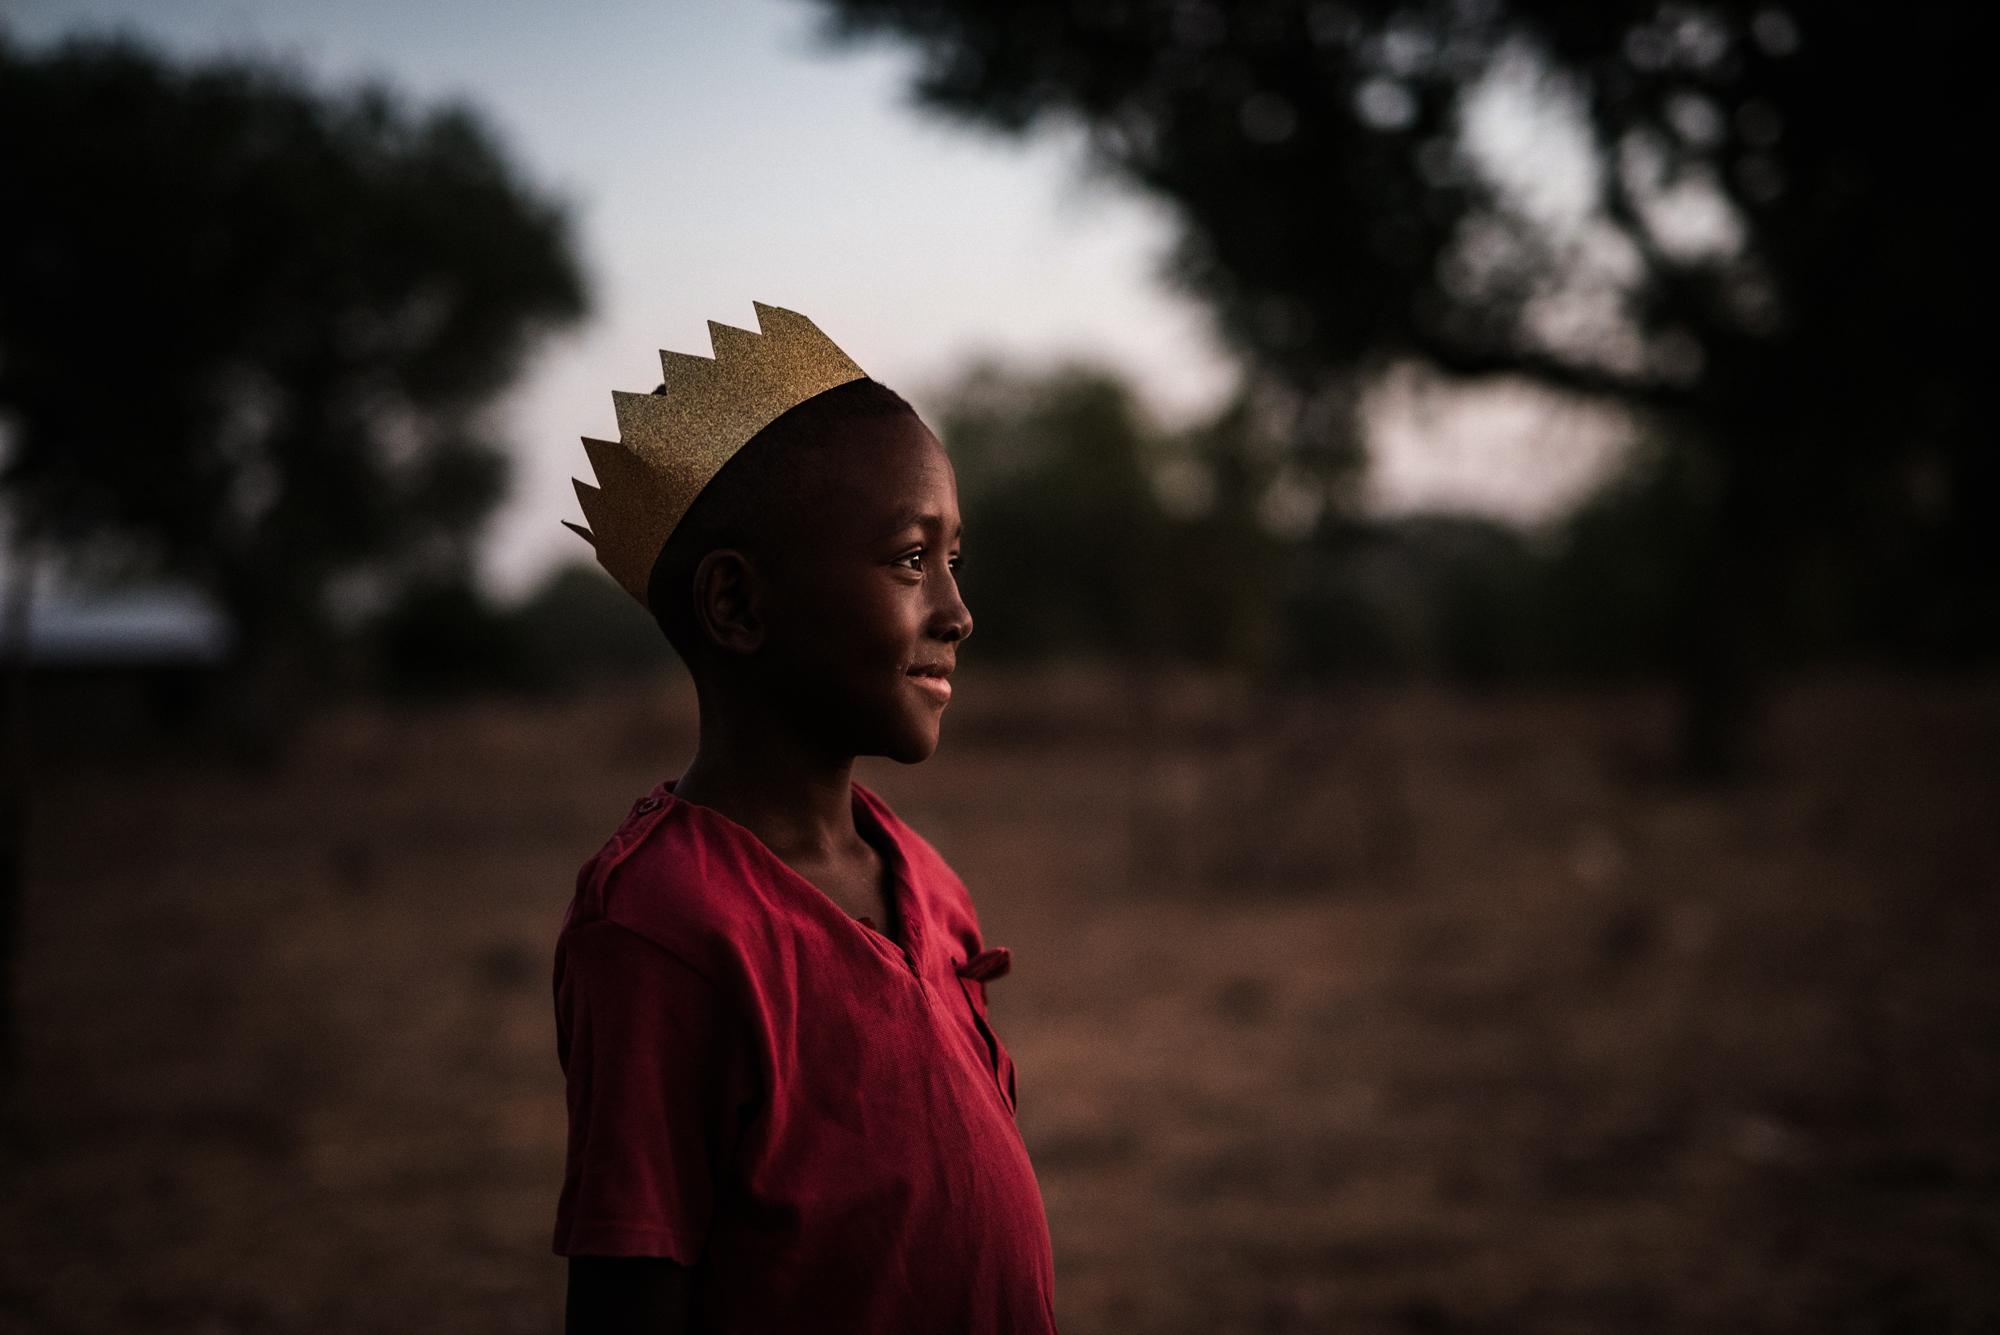 EMBR_Ghana_Africa_Humanitarian_Photographer_TaraShupe_175-FINAL-WEB.jpg